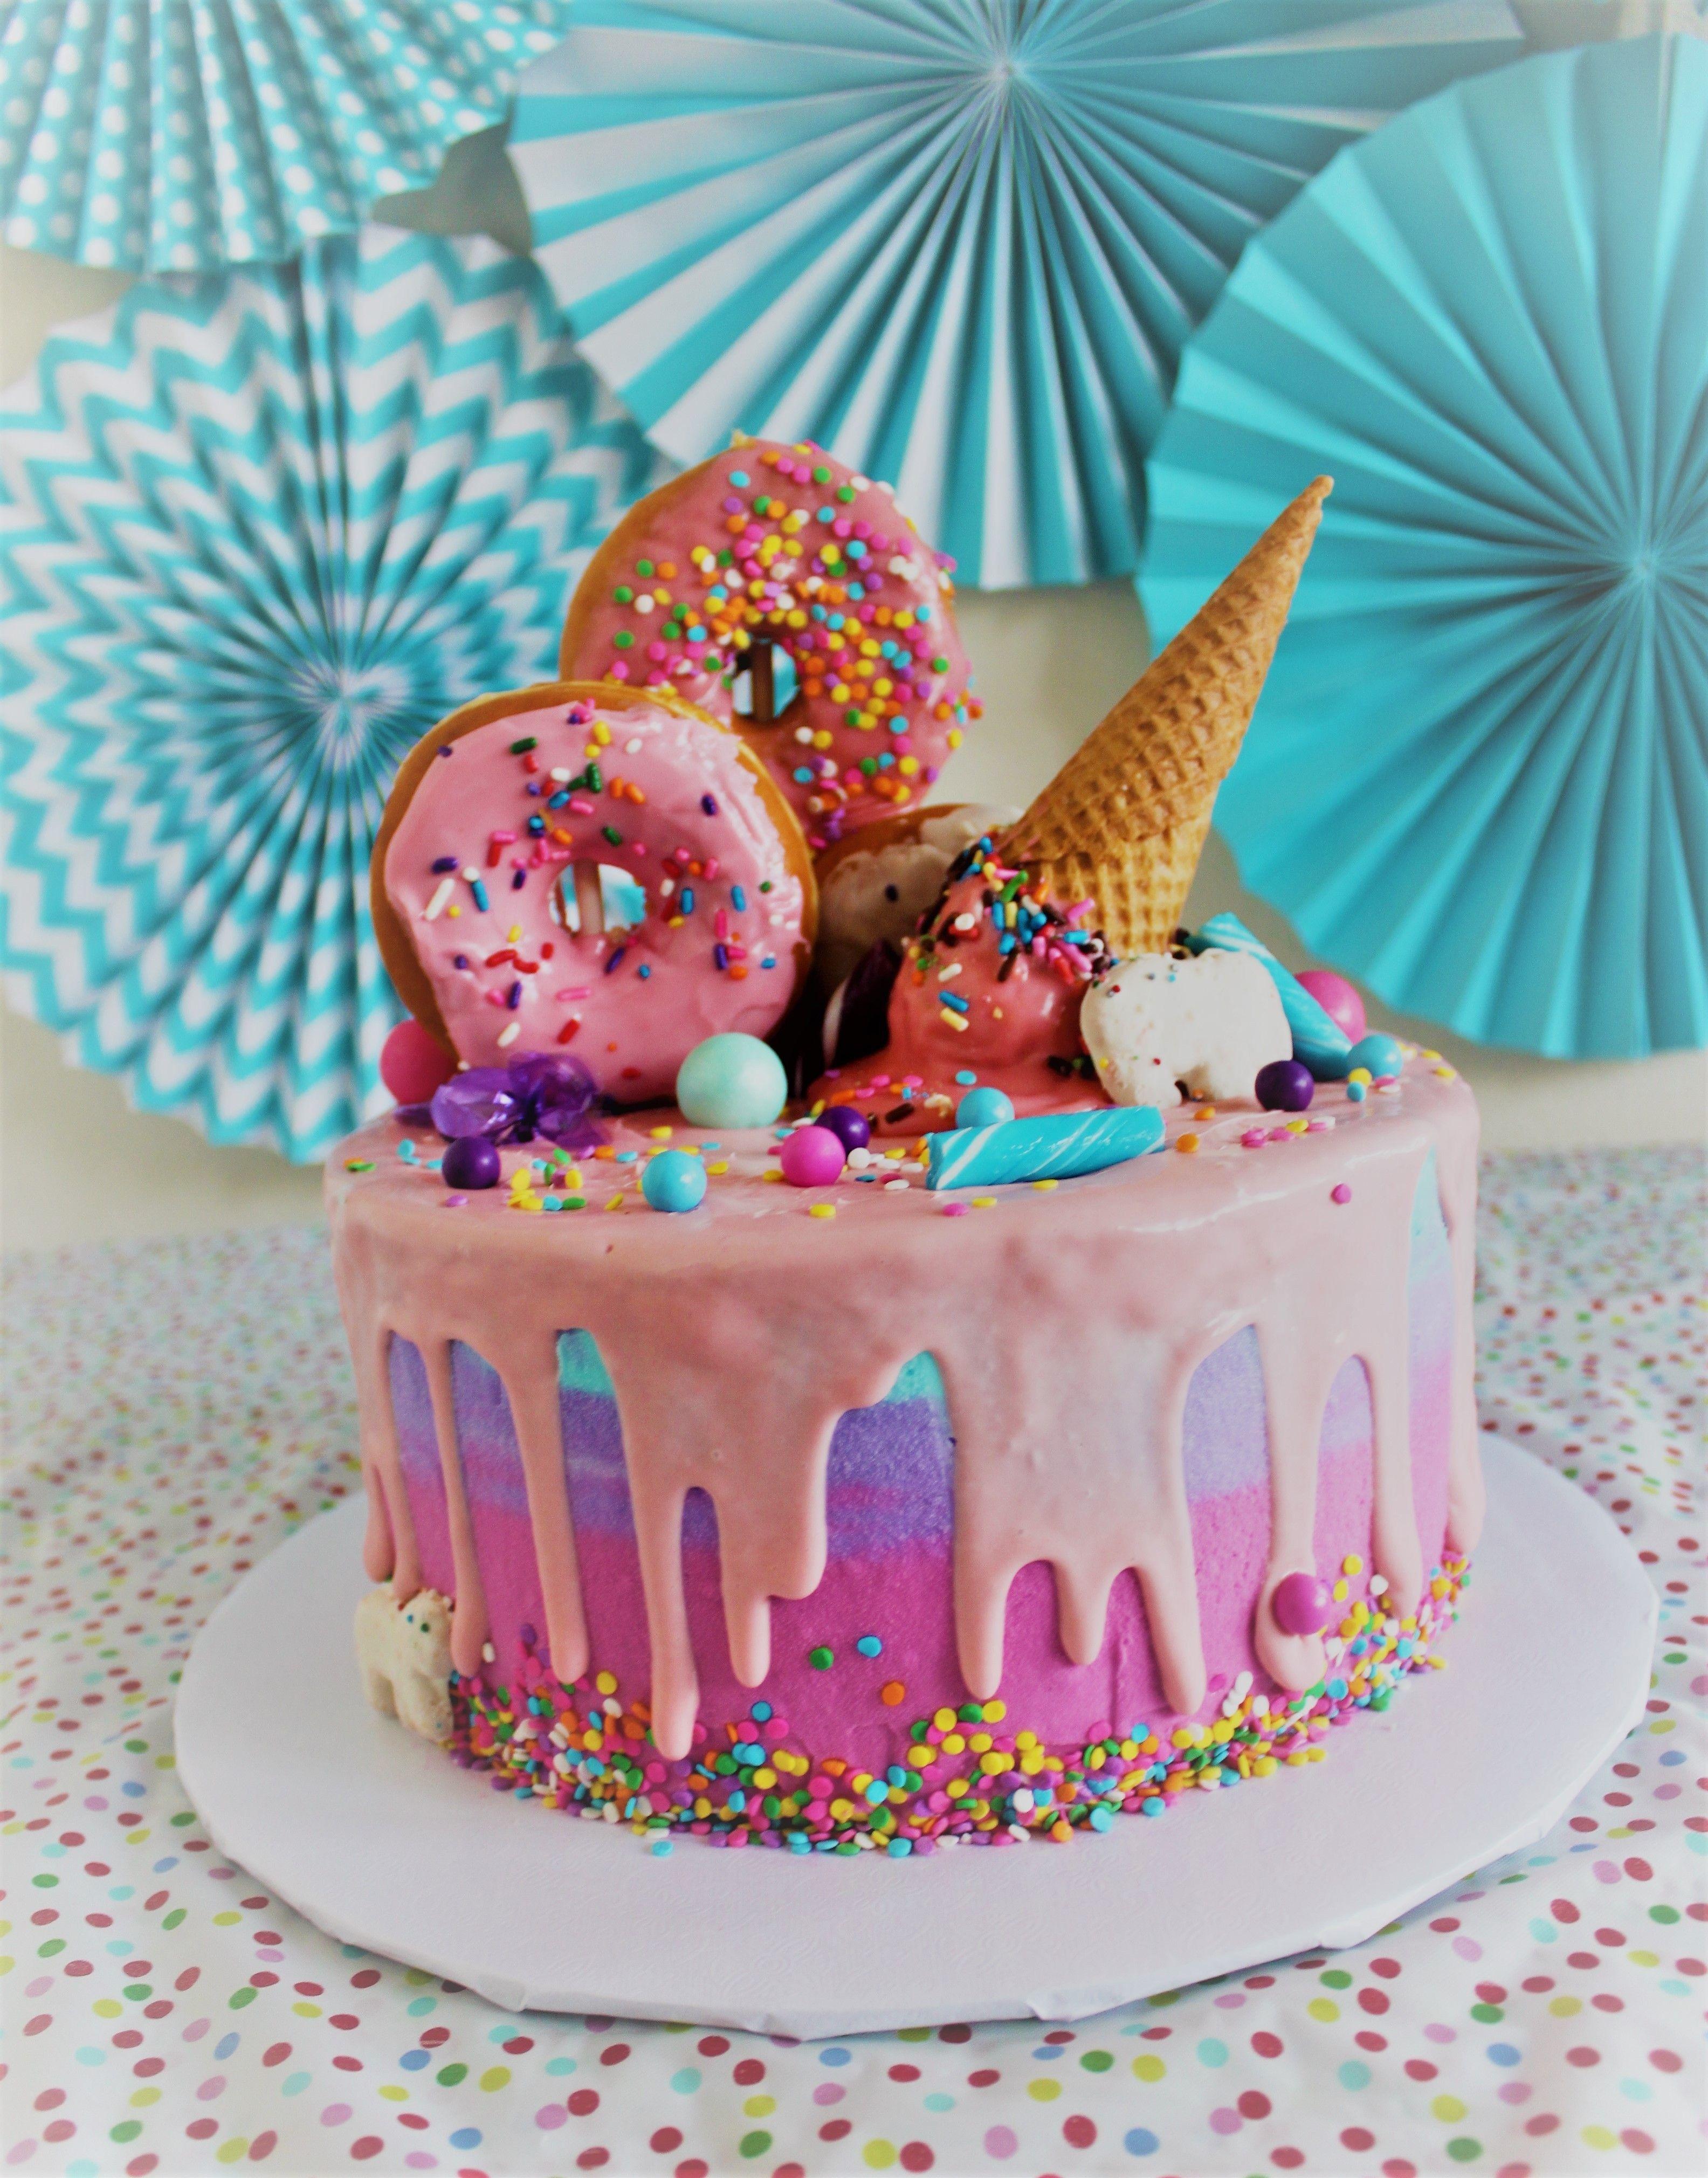 Pleasing 32 Amazing Picture Of Birthday Cake Ice Cream Ice Cream Cake Recipe Funny Birthday Cards Online Alyptdamsfinfo